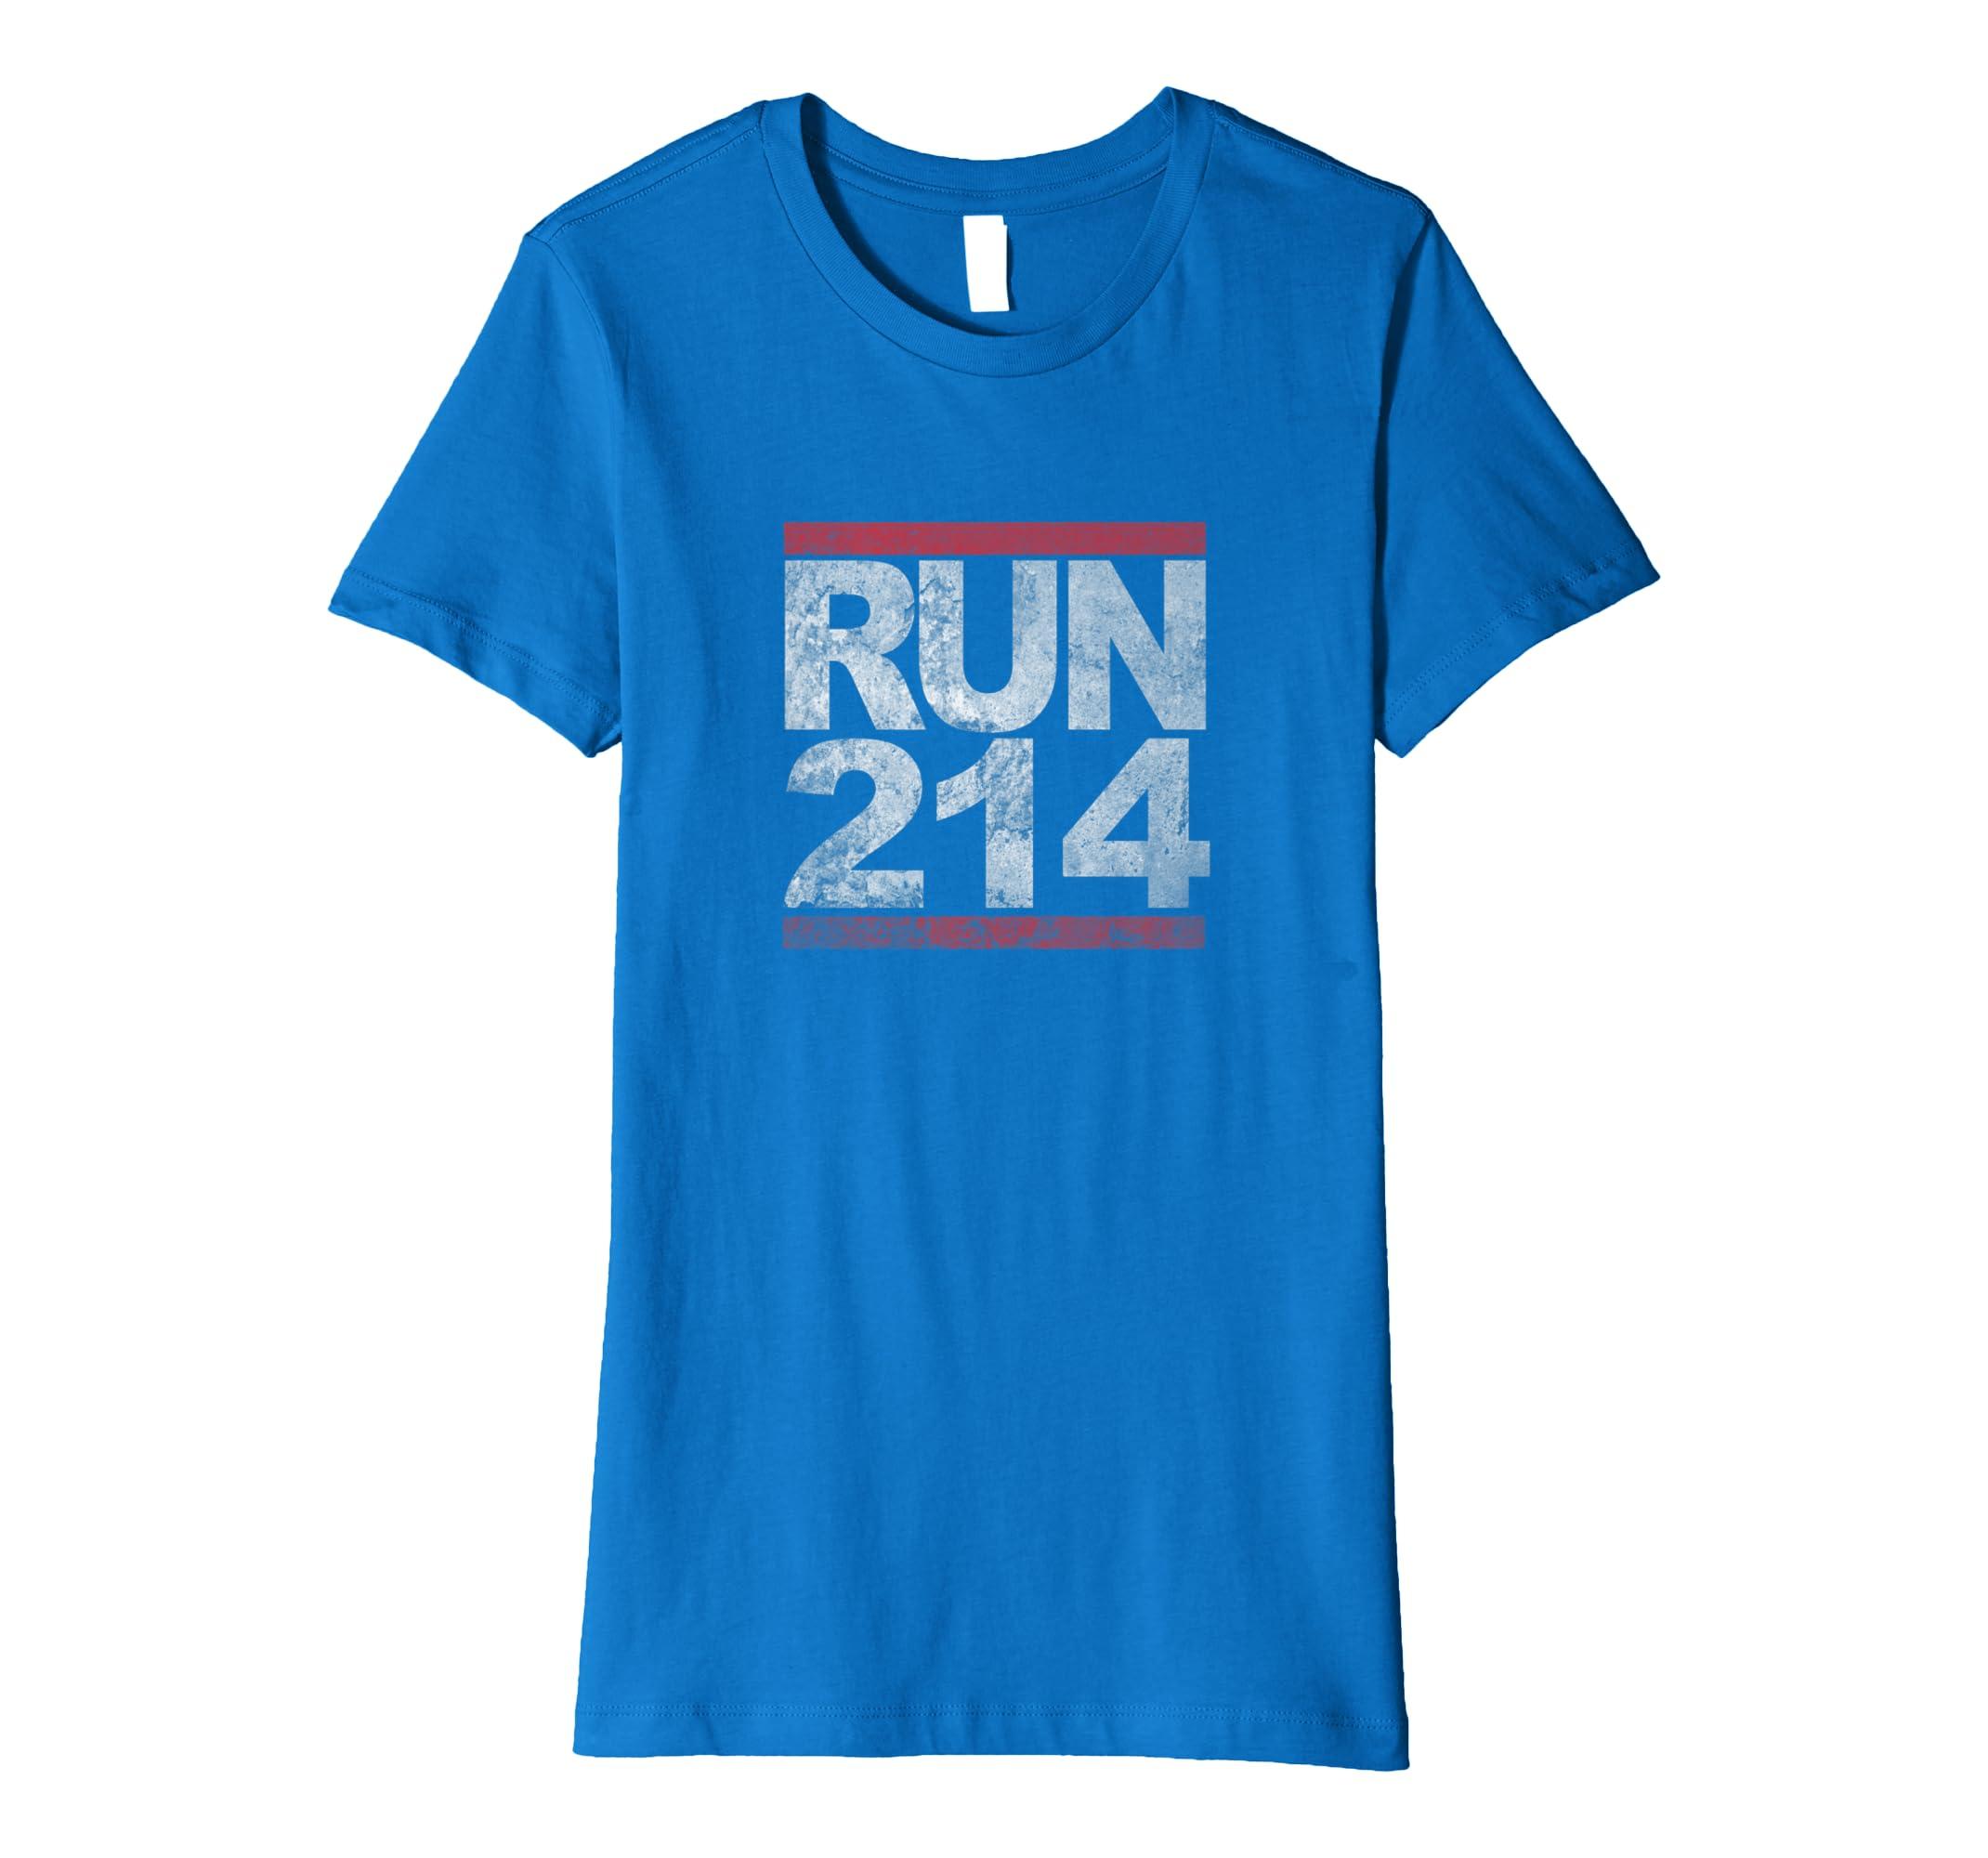 ff13154411eac Amazon.com: Run 214 T-Shirt Irving TX Jogging Shirt: Clothing